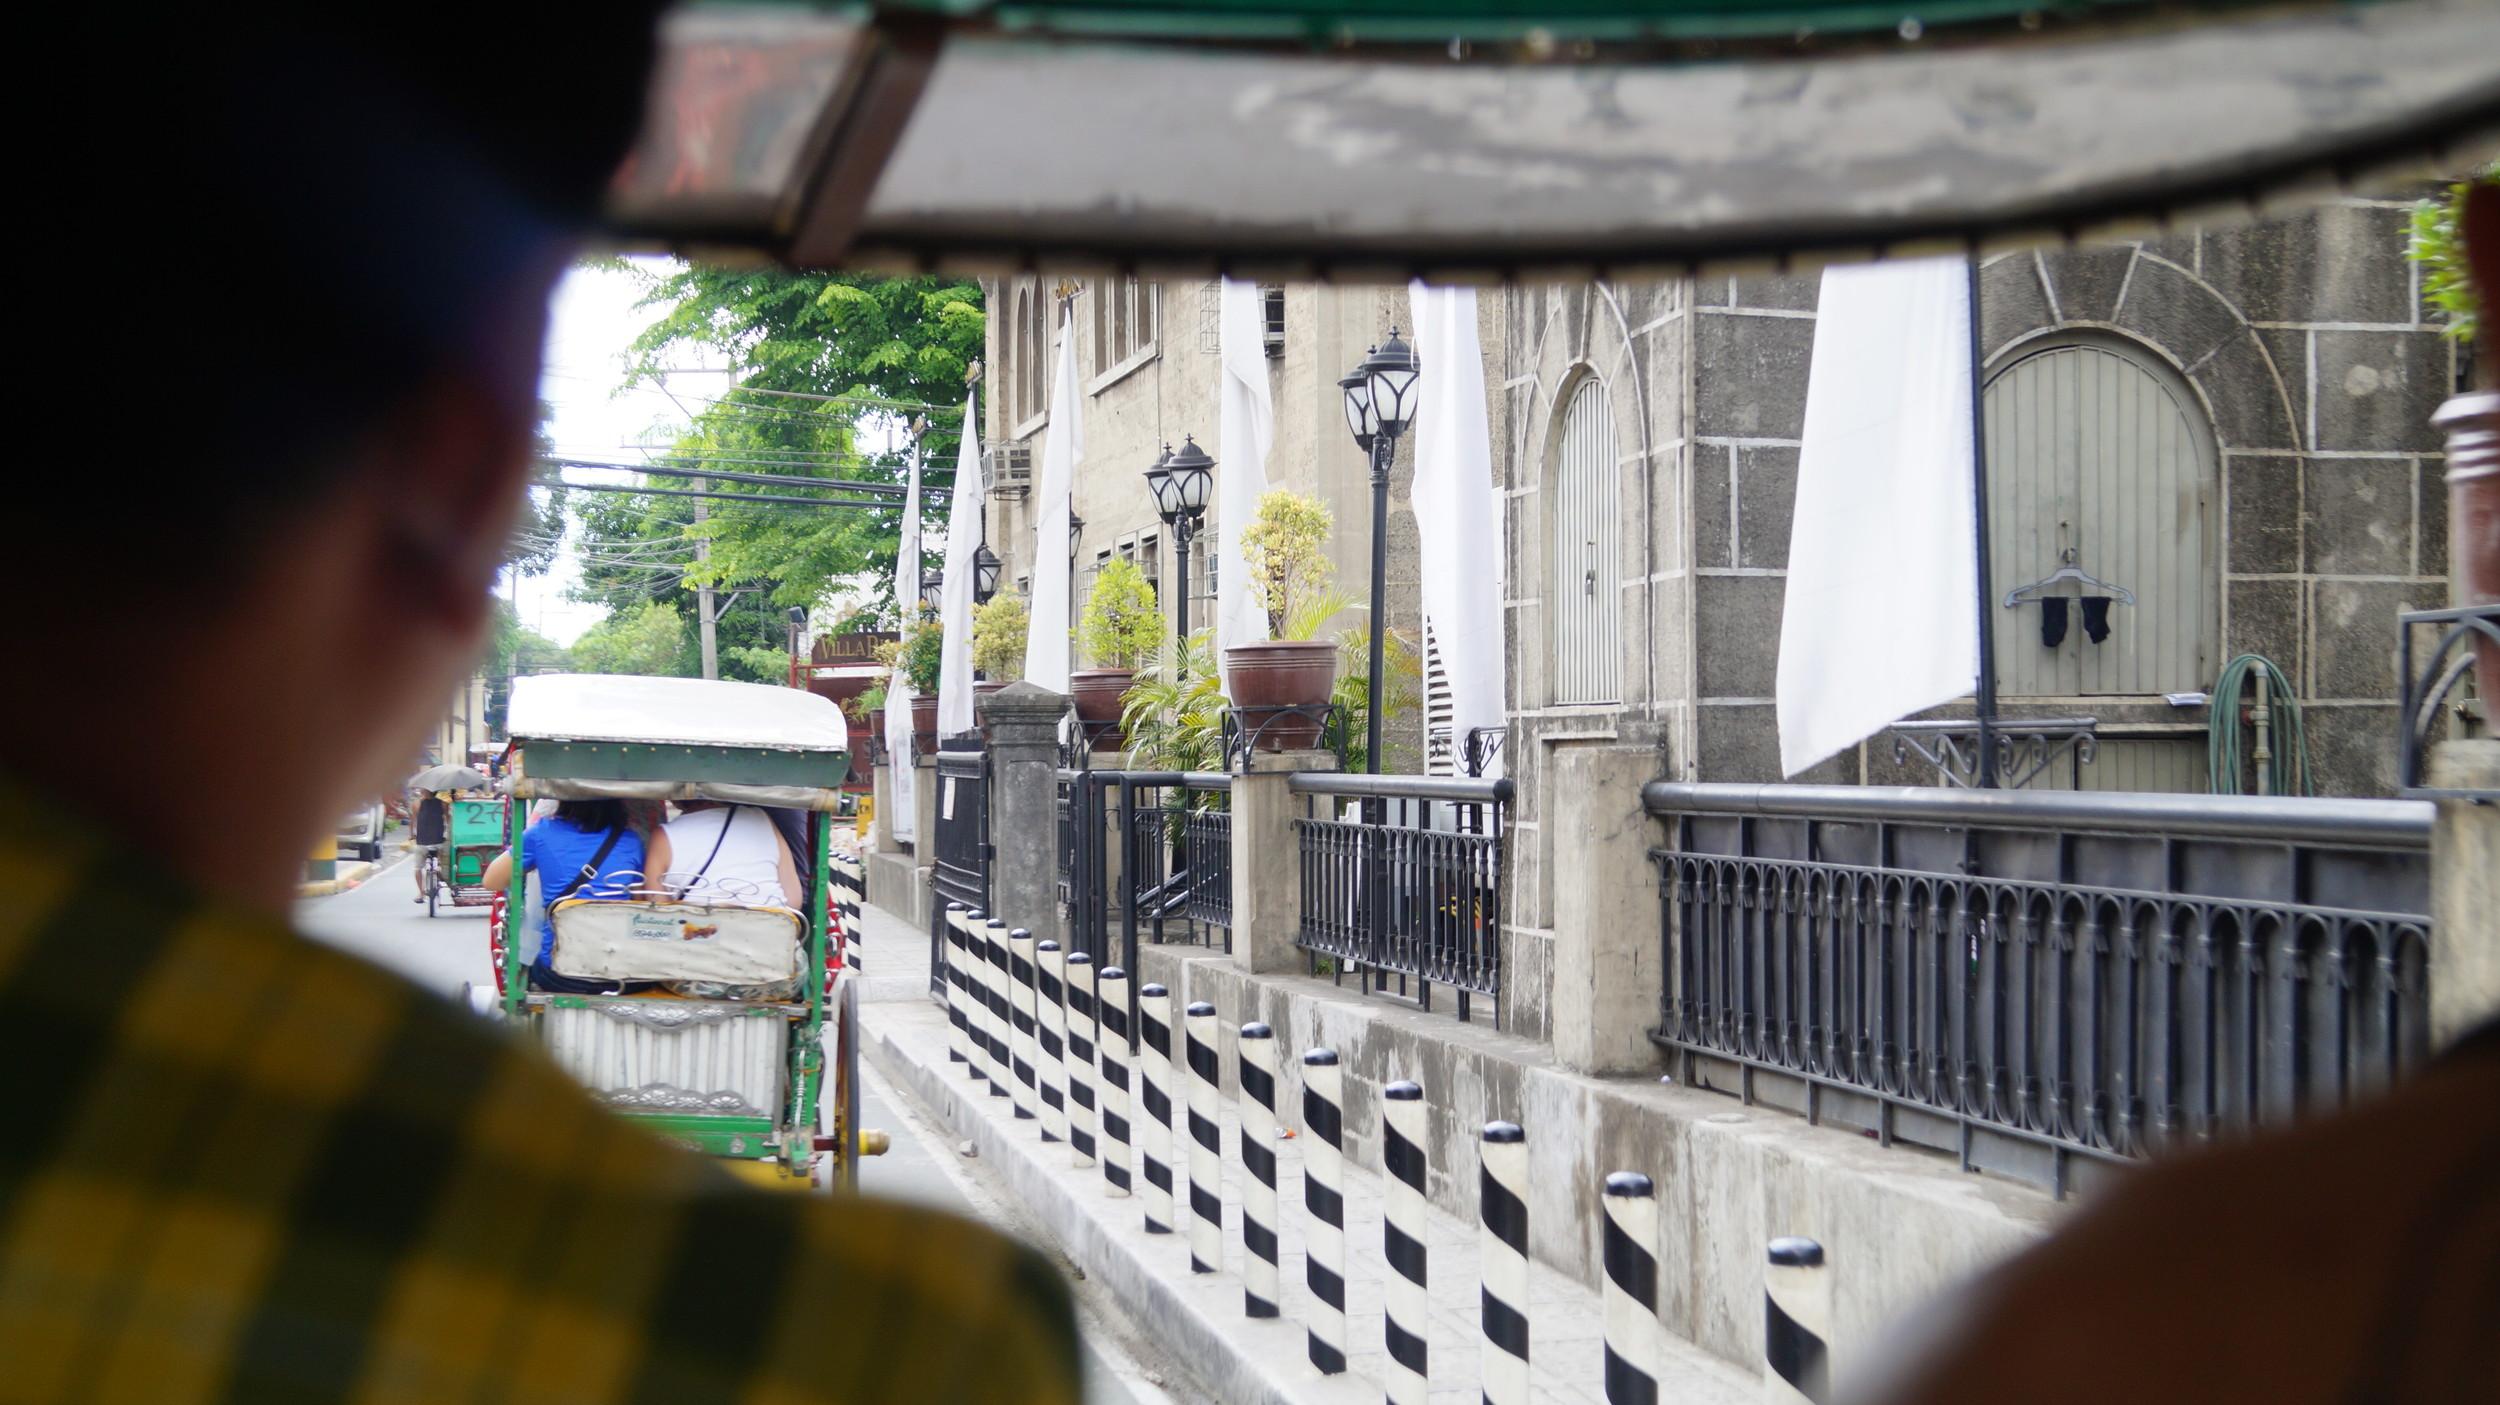 Intramuros tour Manila. Carlos Celdran. Horse carriage. Citadel Spanish. 2015.